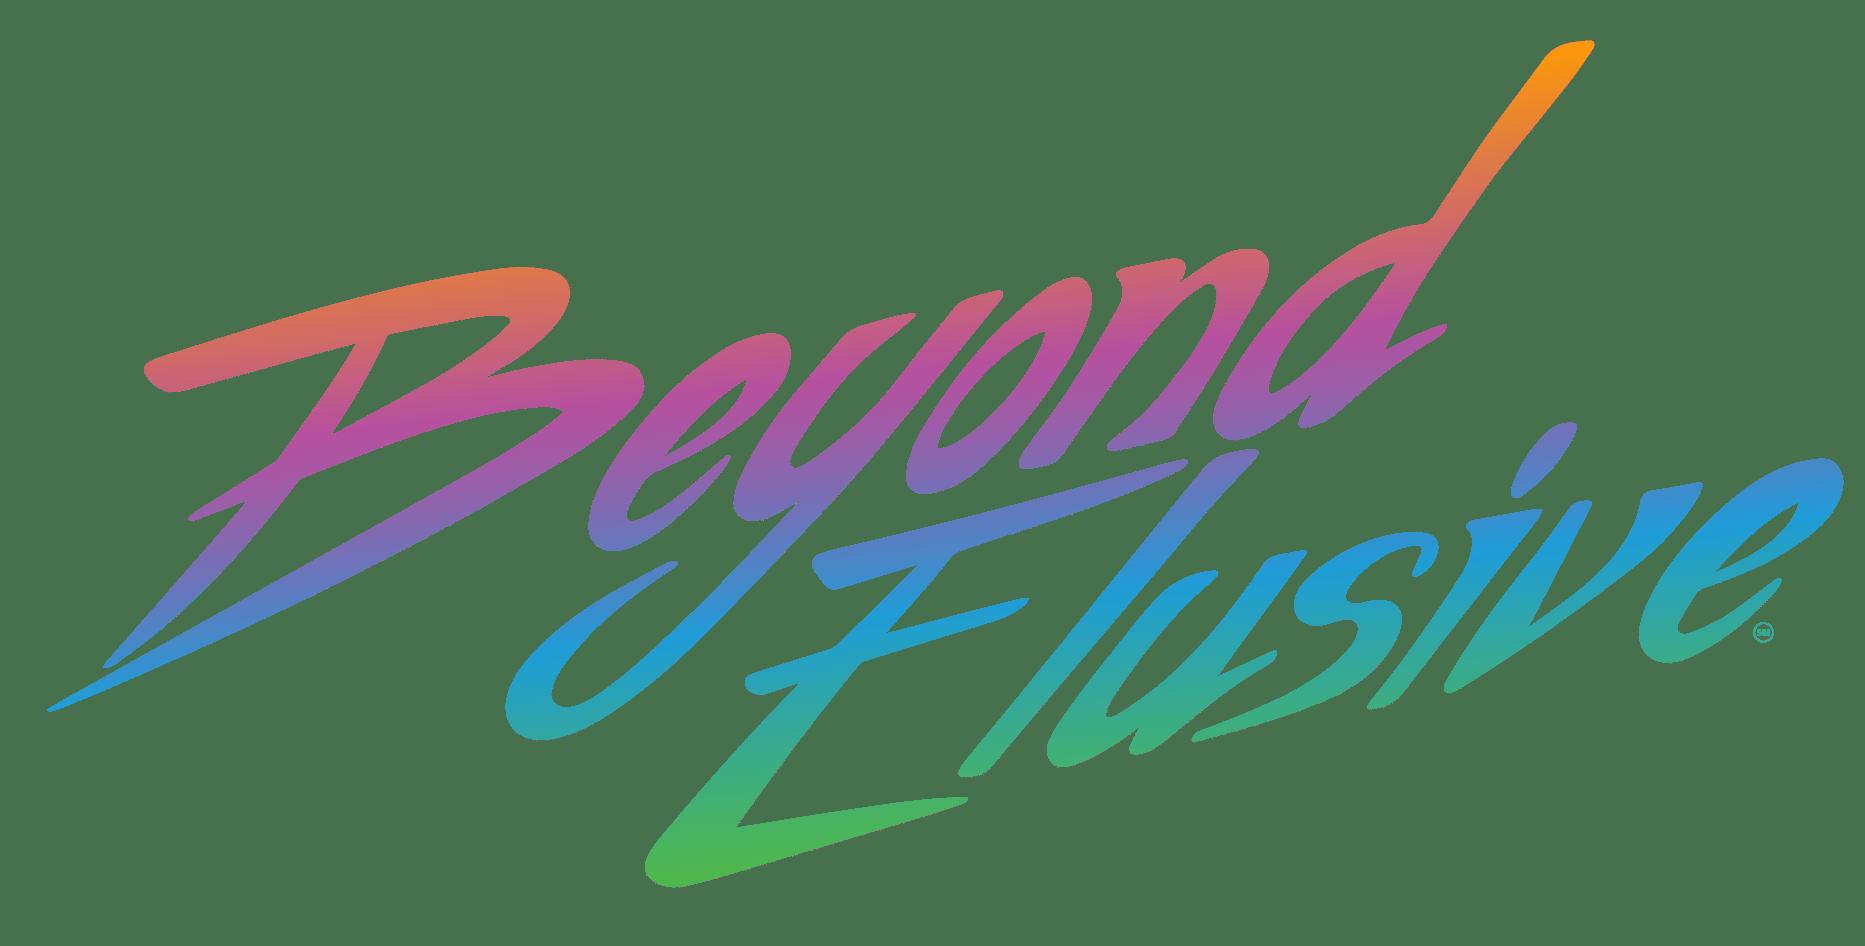 Beyond Elusive